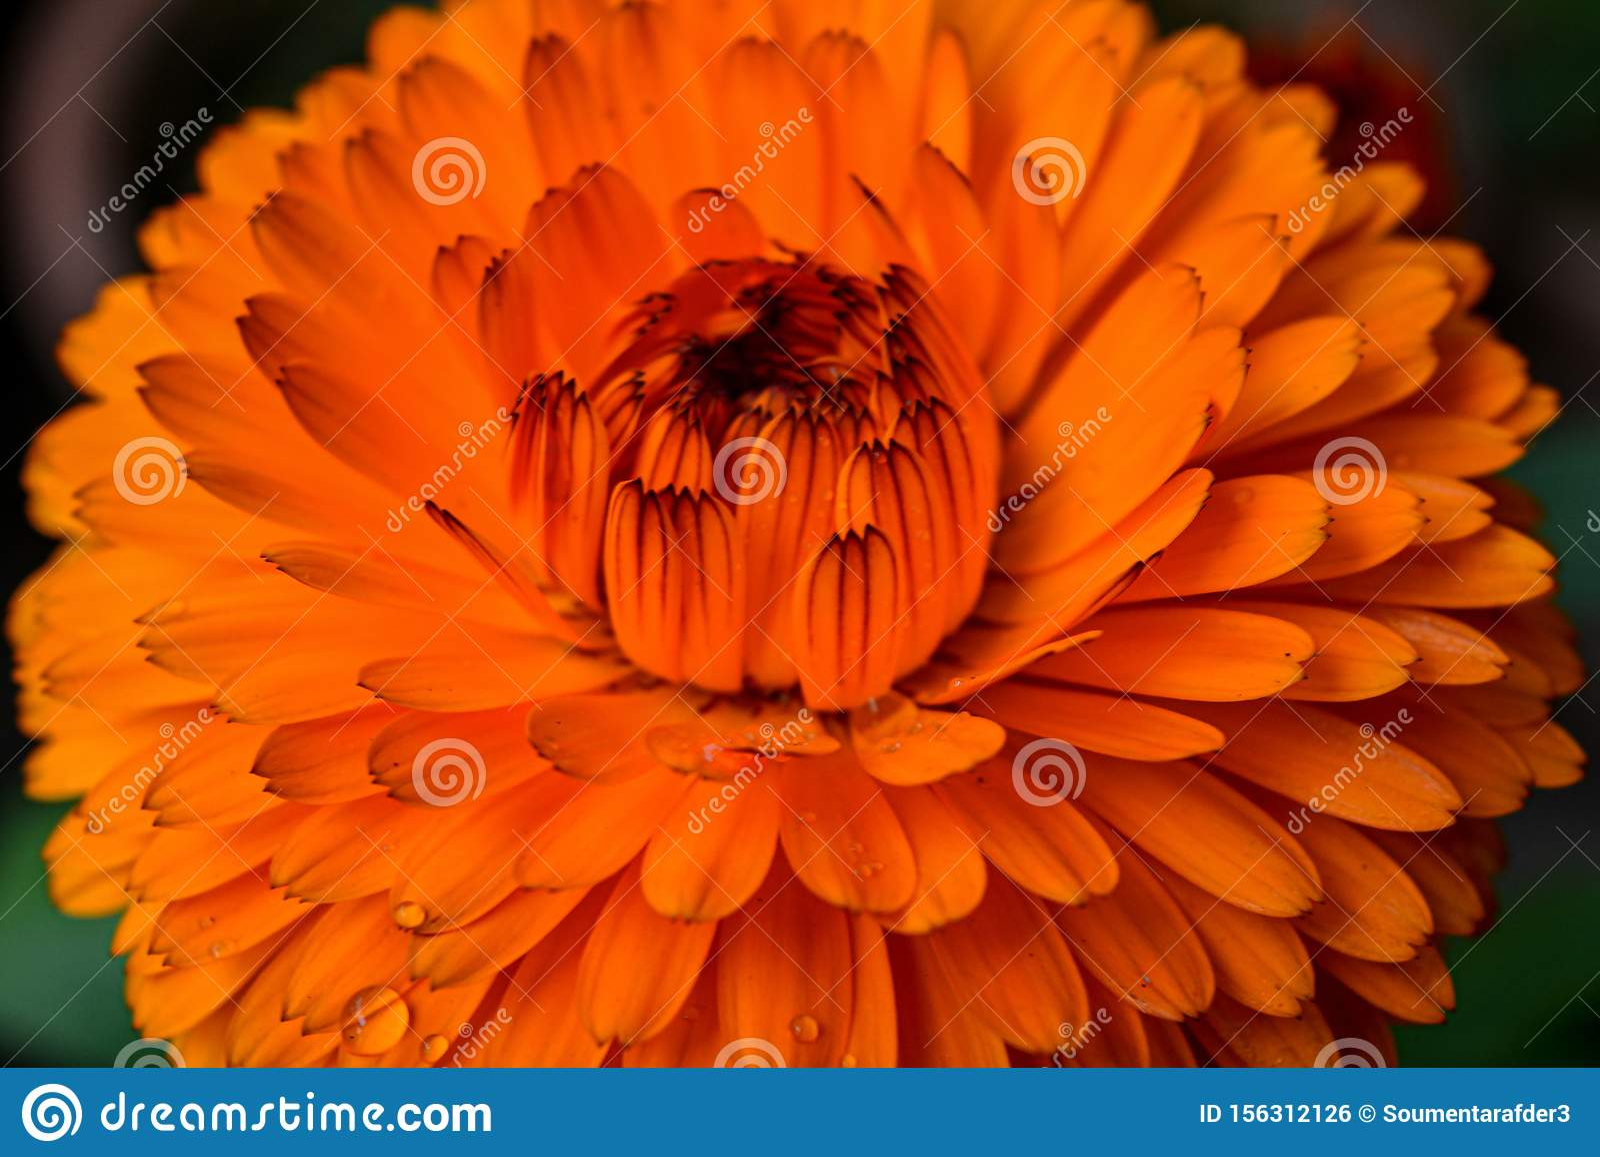 Beautiful orange color Calendula flower